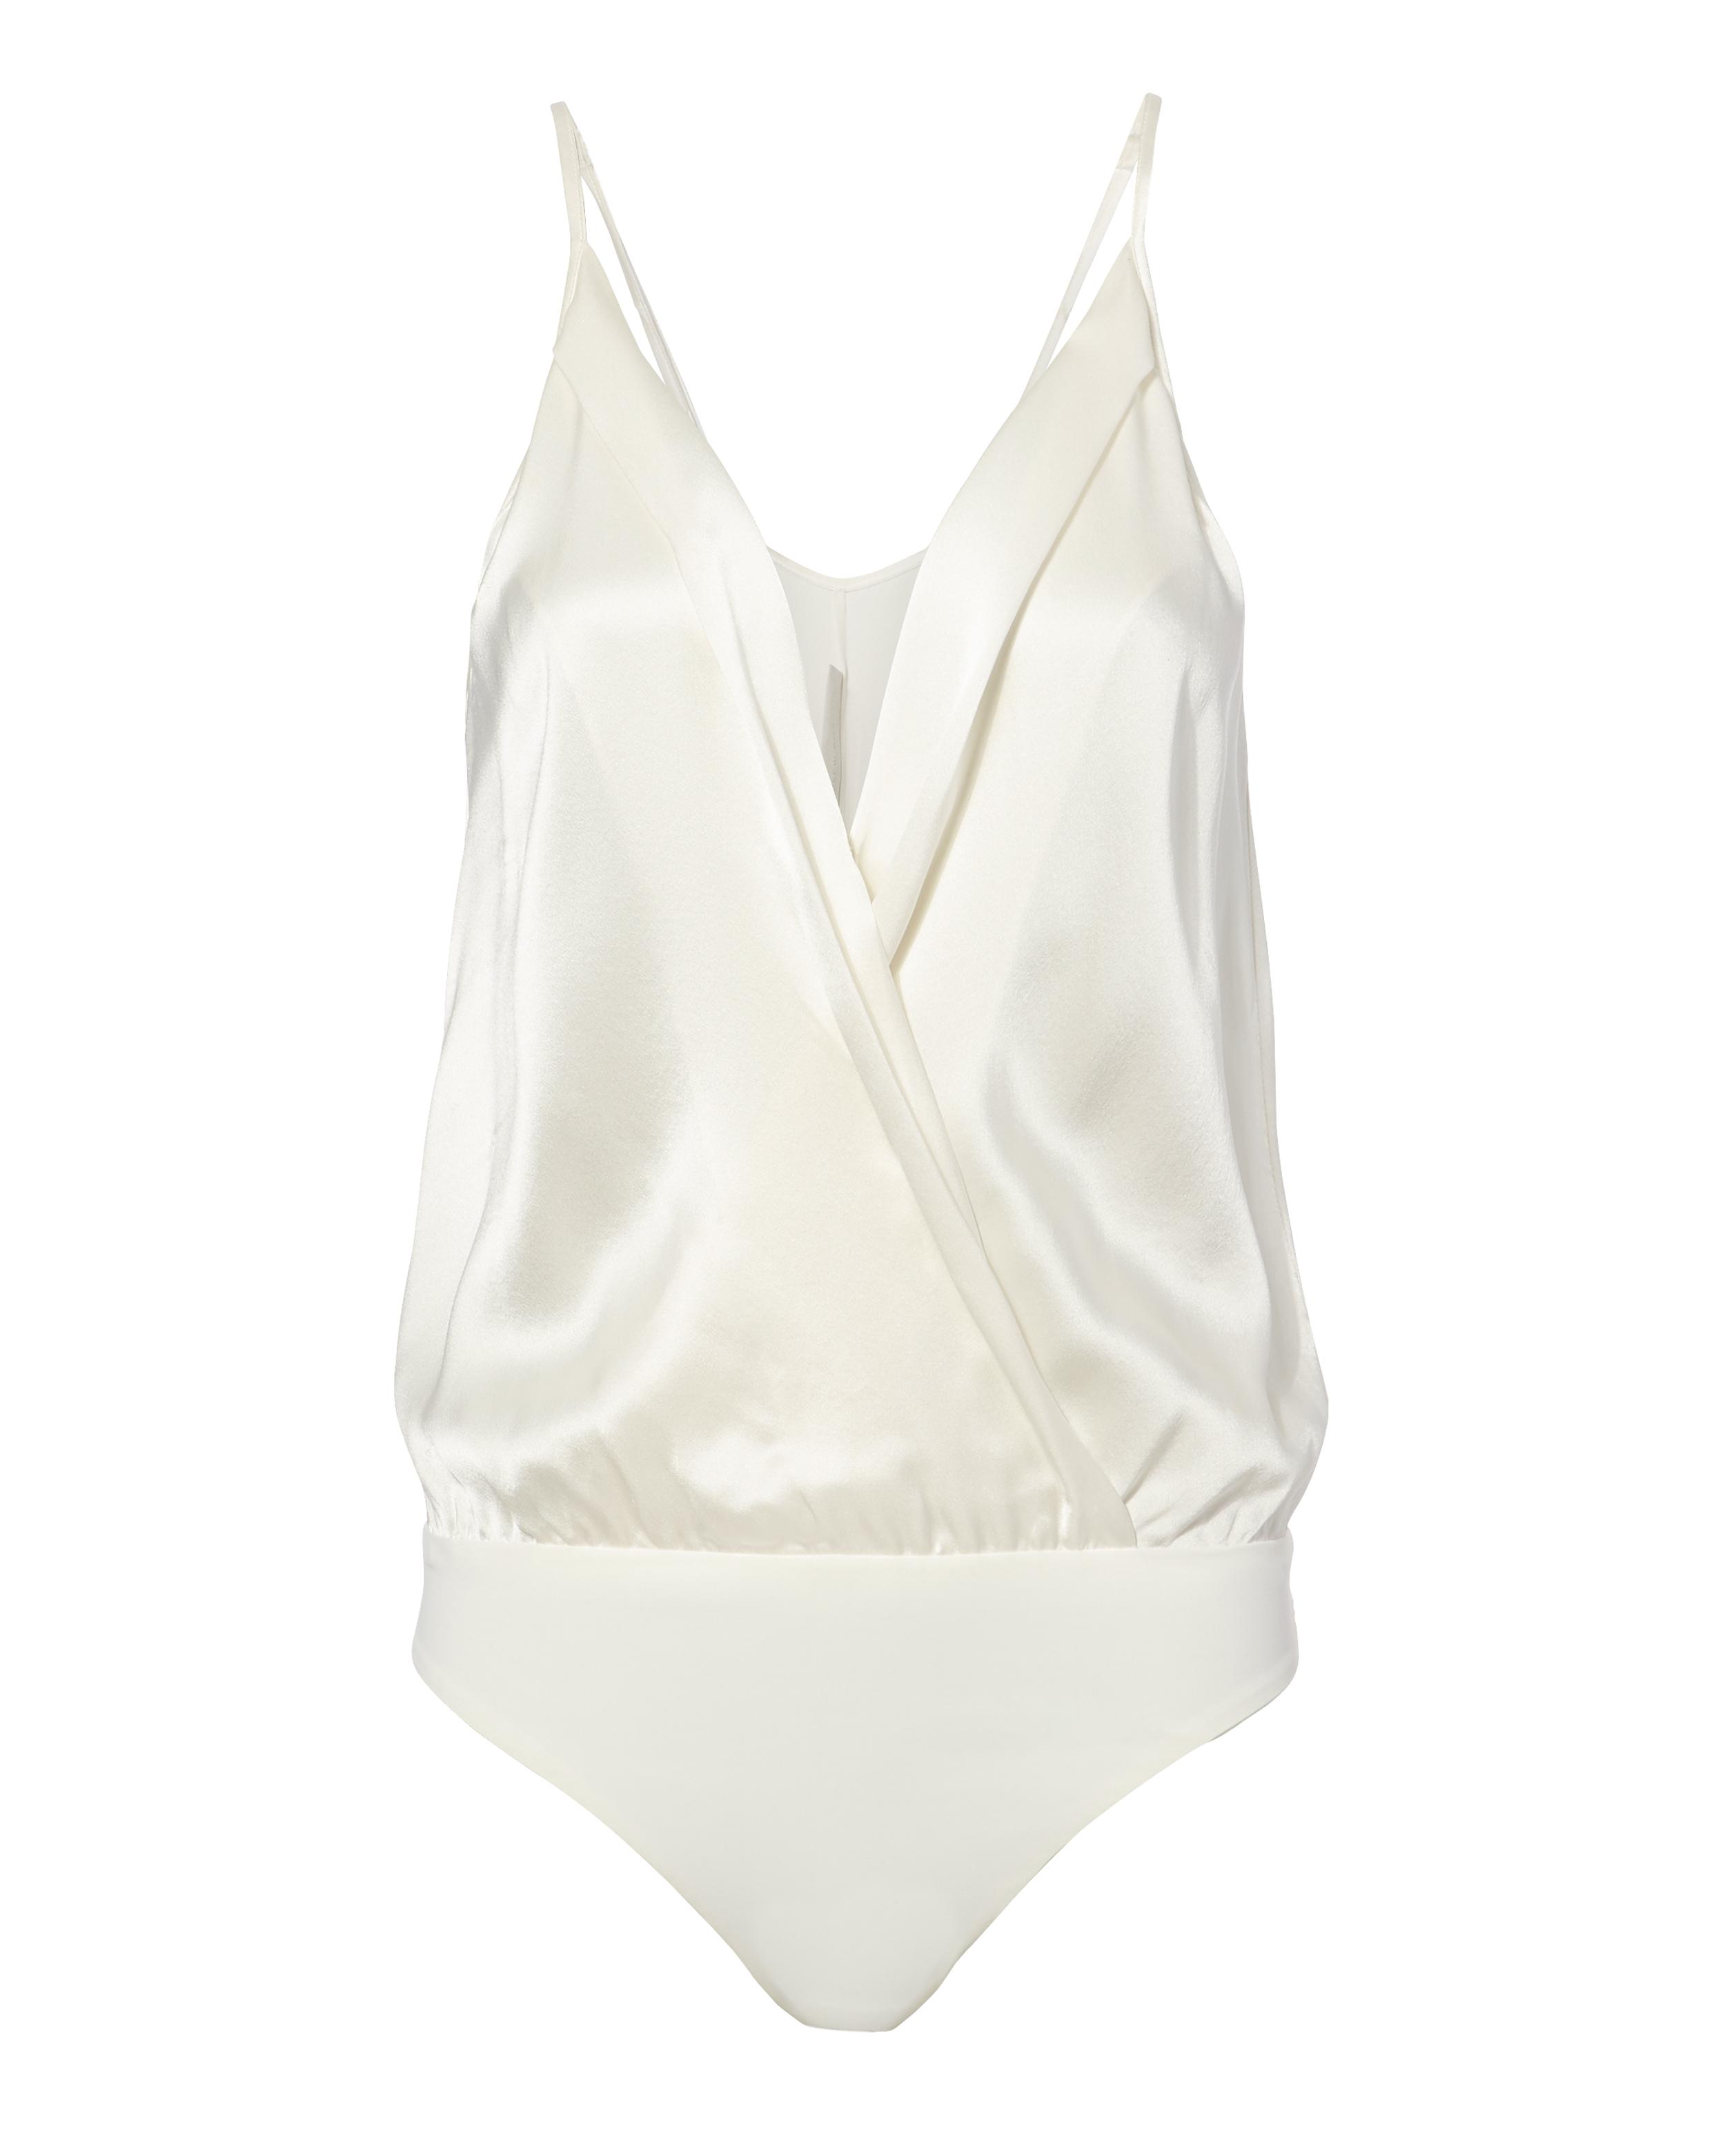 MASON Silk Cami Cross Front White Bodysuit